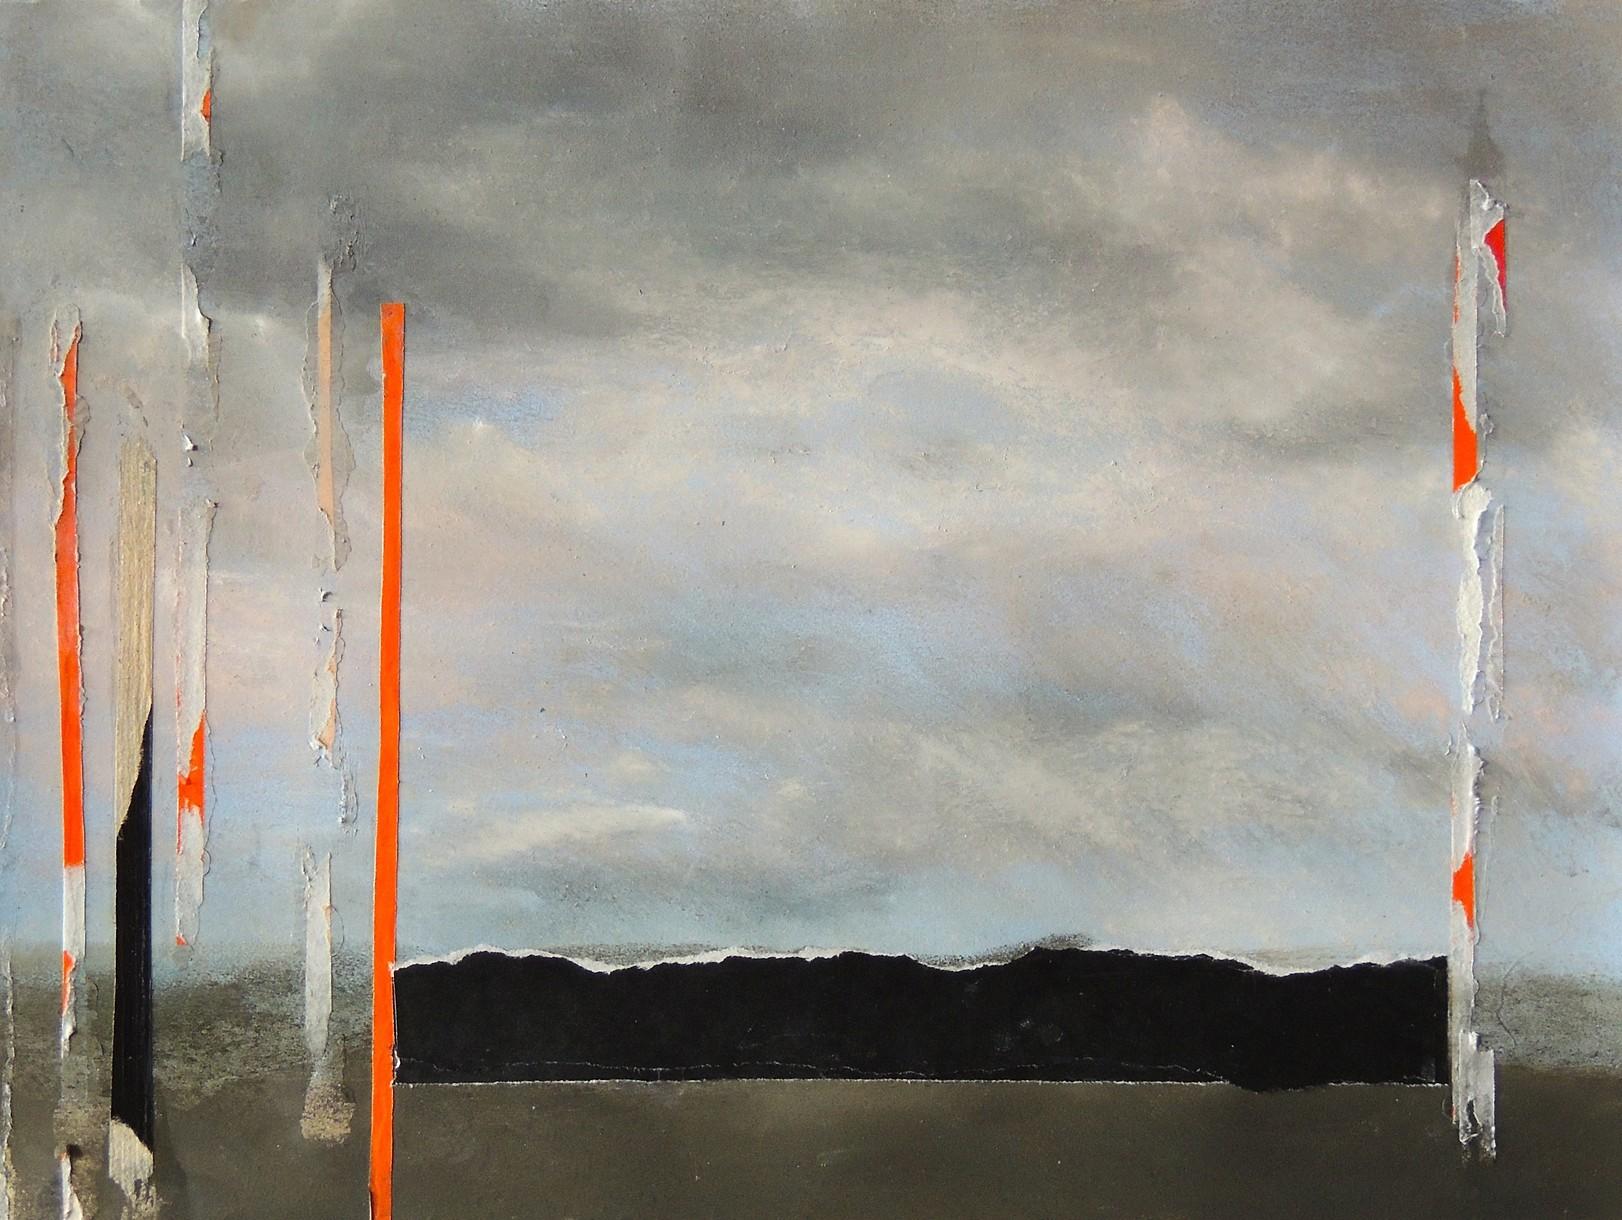 Nancy Wisti Grayson,  Displaced Landscape: Departure , Pastel, graphite, origami paper on paper, 10.5 x 14 inches